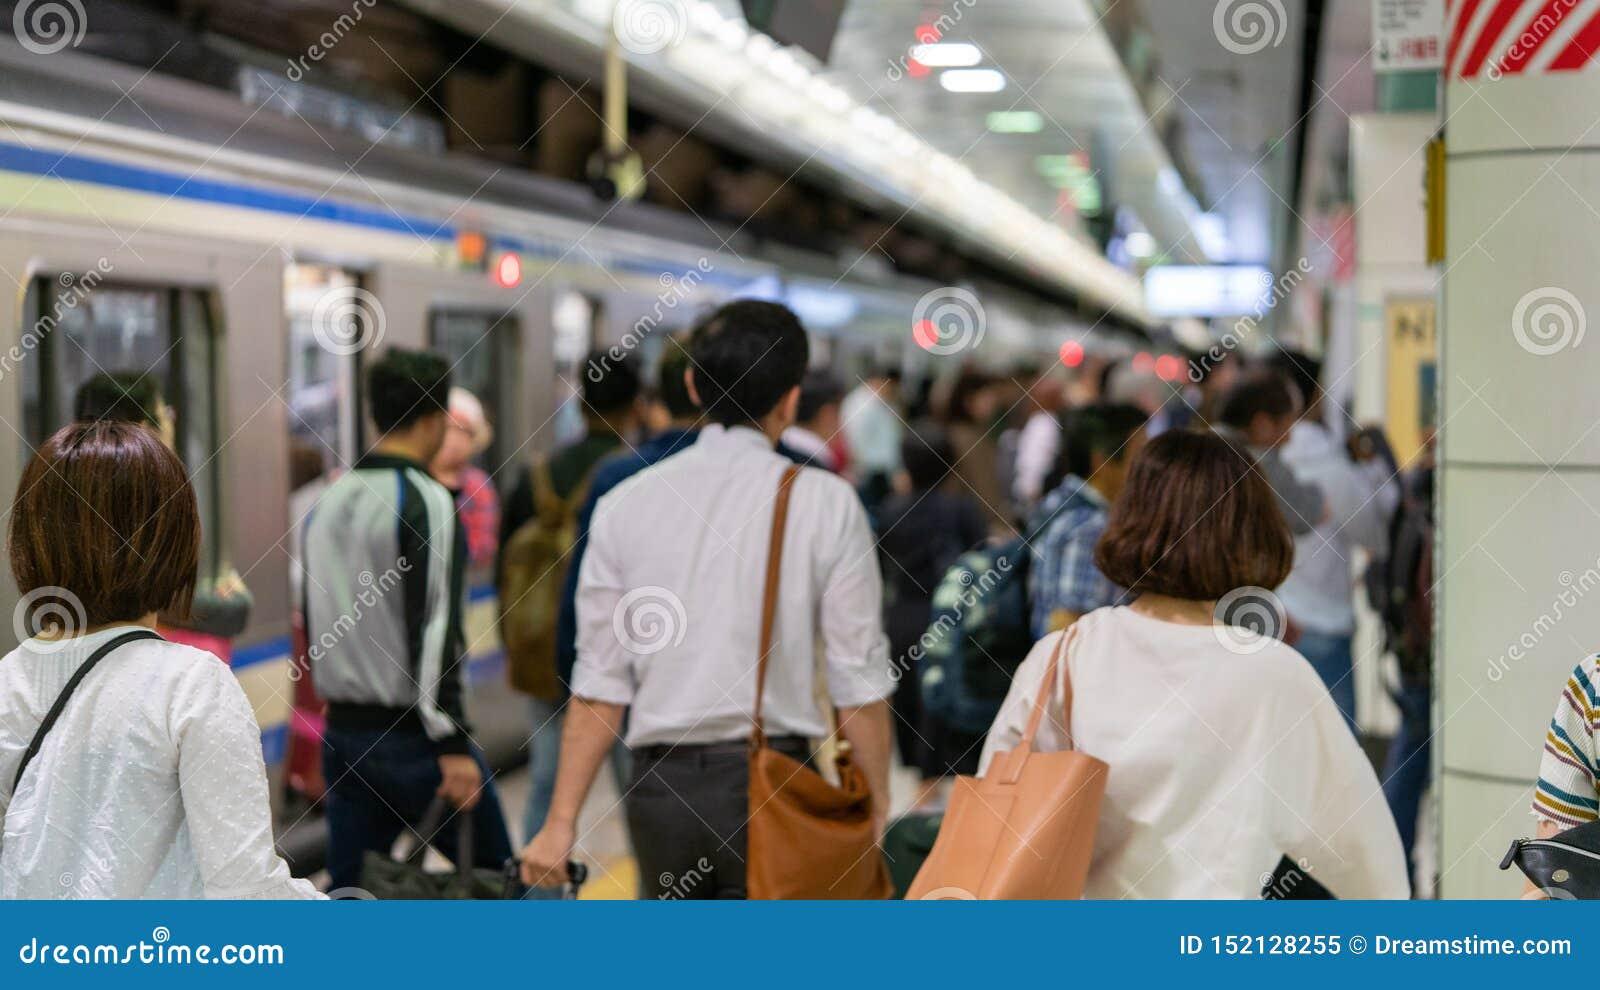 Japan Metro - rush hour